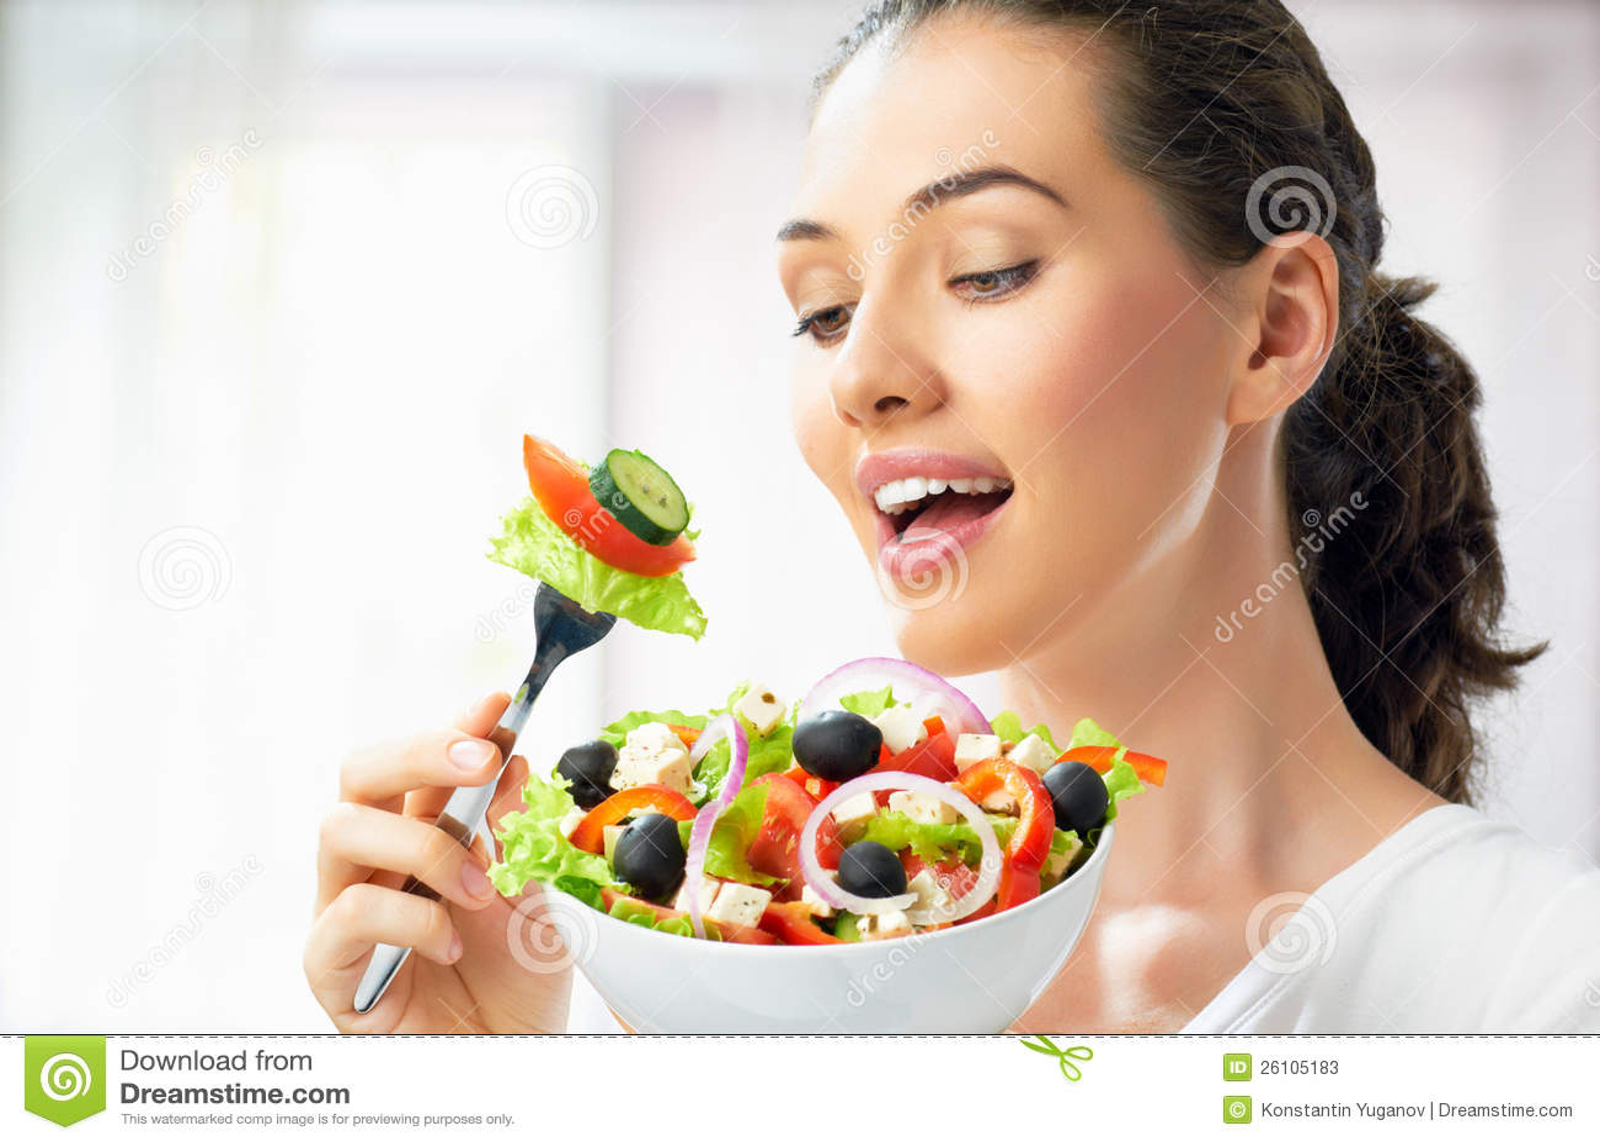 Manger de la nourriture saine